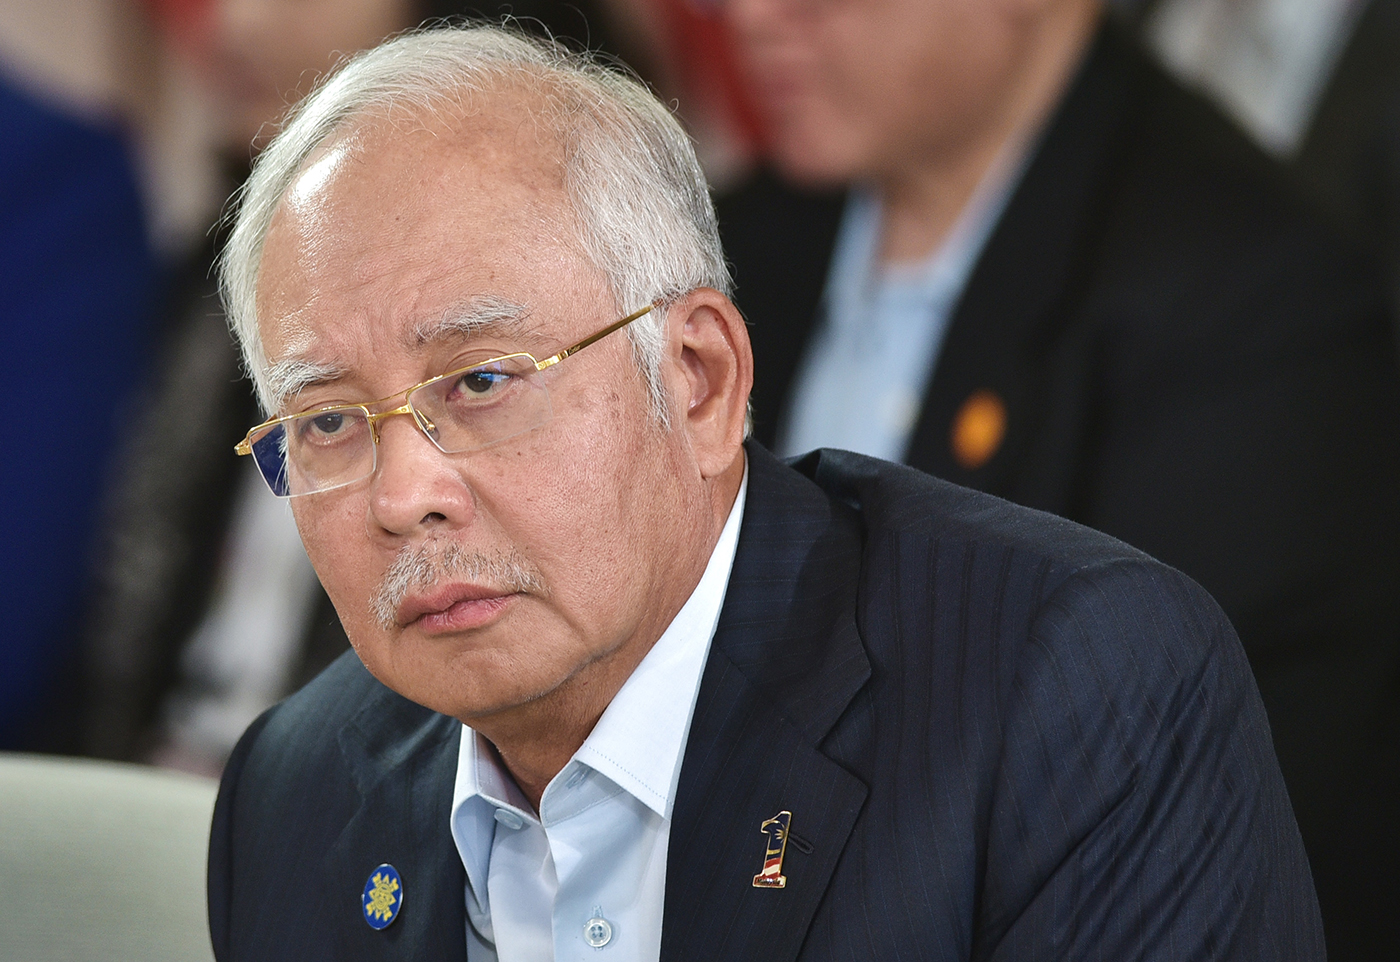 le Premier ministre Najib Razak.